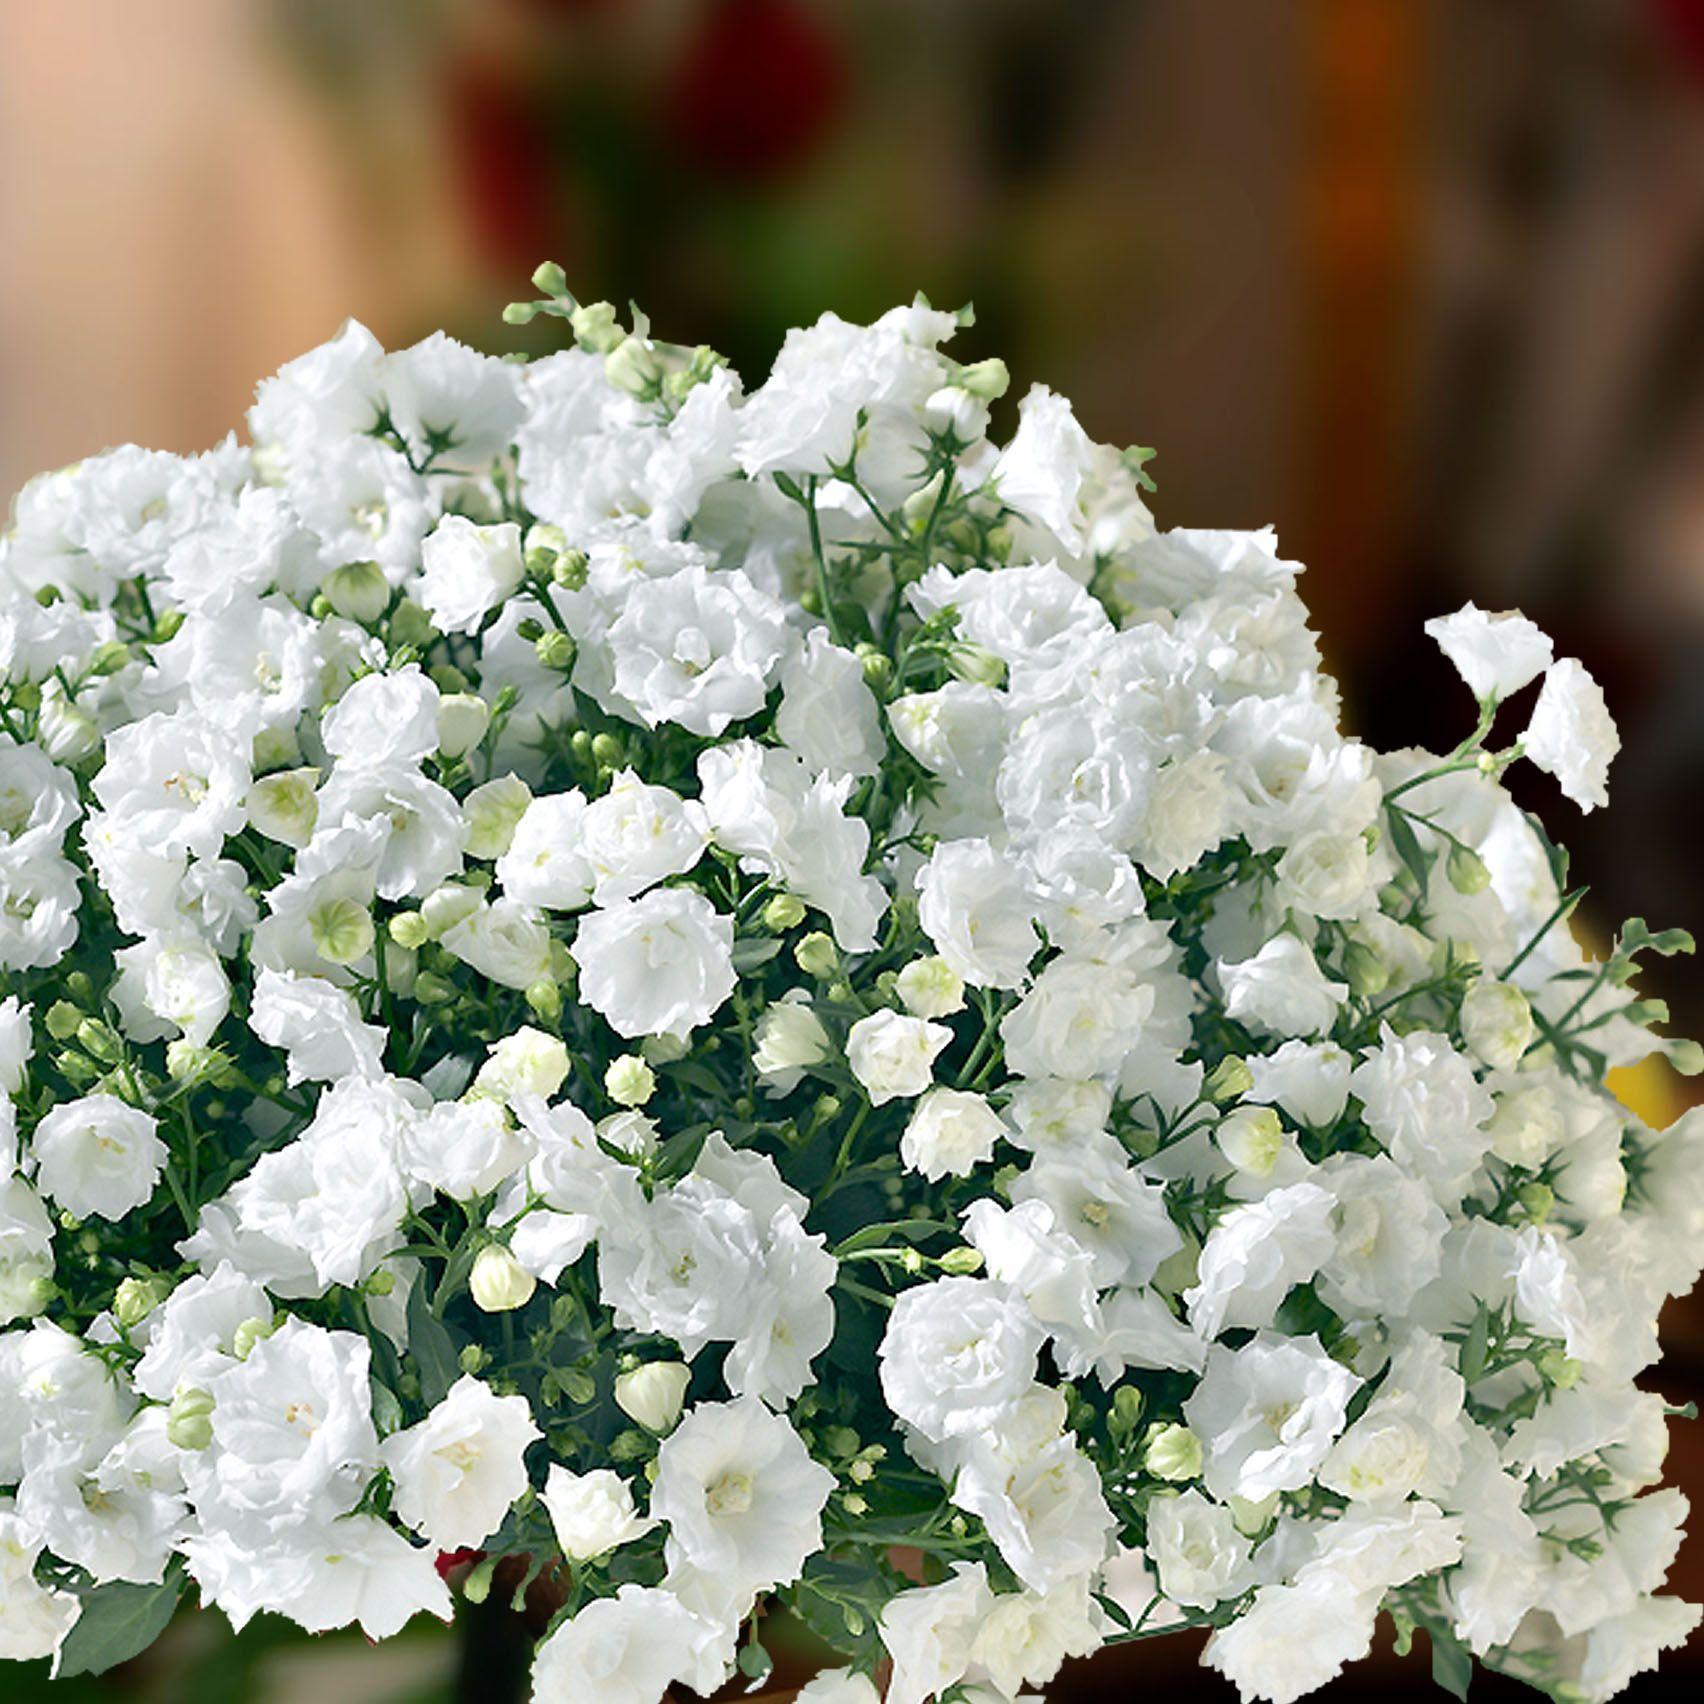 White Wonder campanula flowers